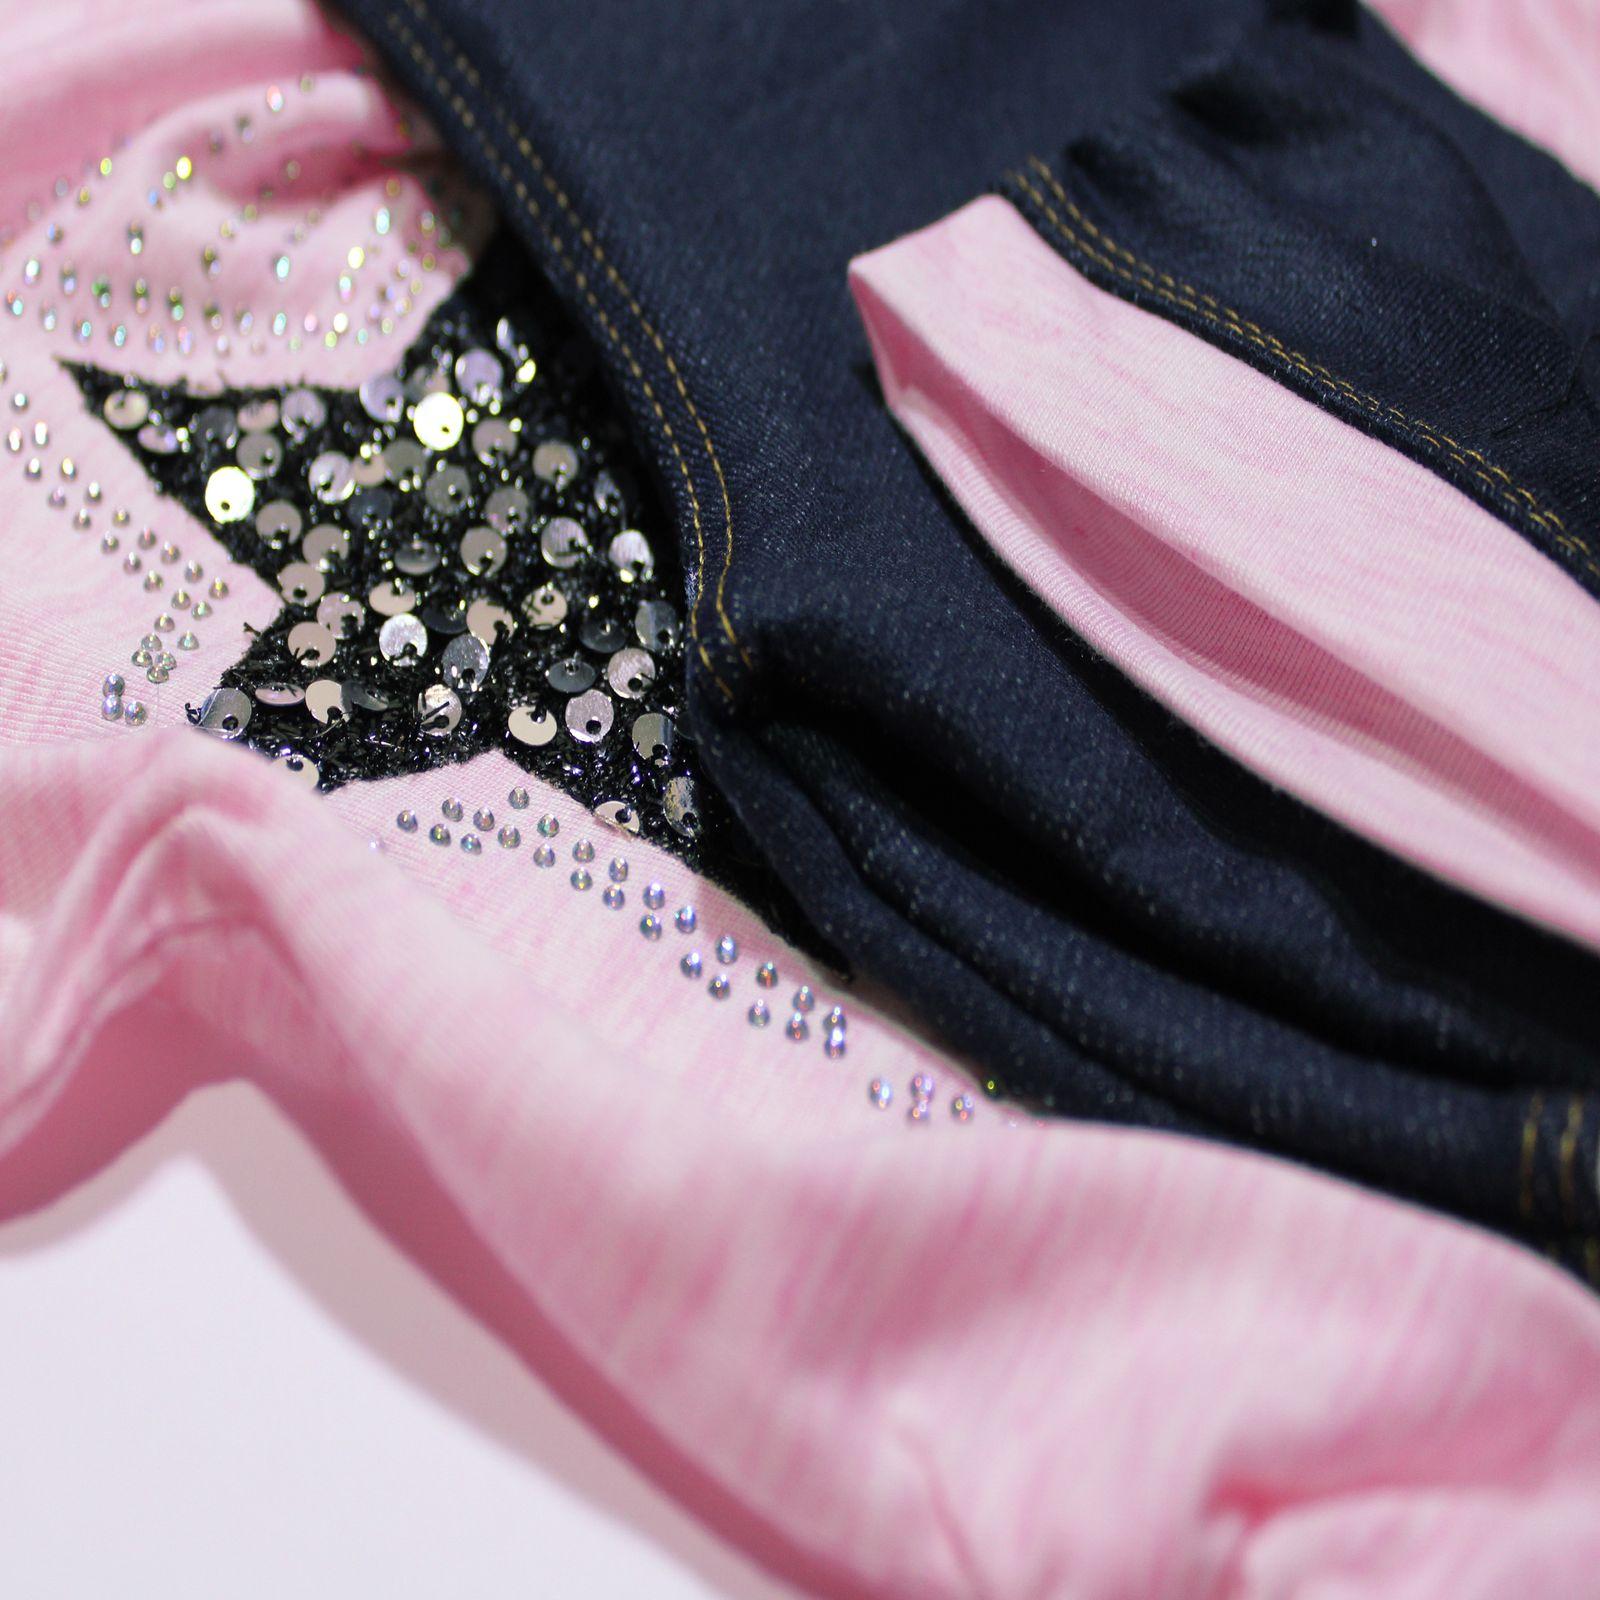 ست تیشرت و شلوارک دخترانه طرح ستاره کد ۱۳۶۲ -  - 3